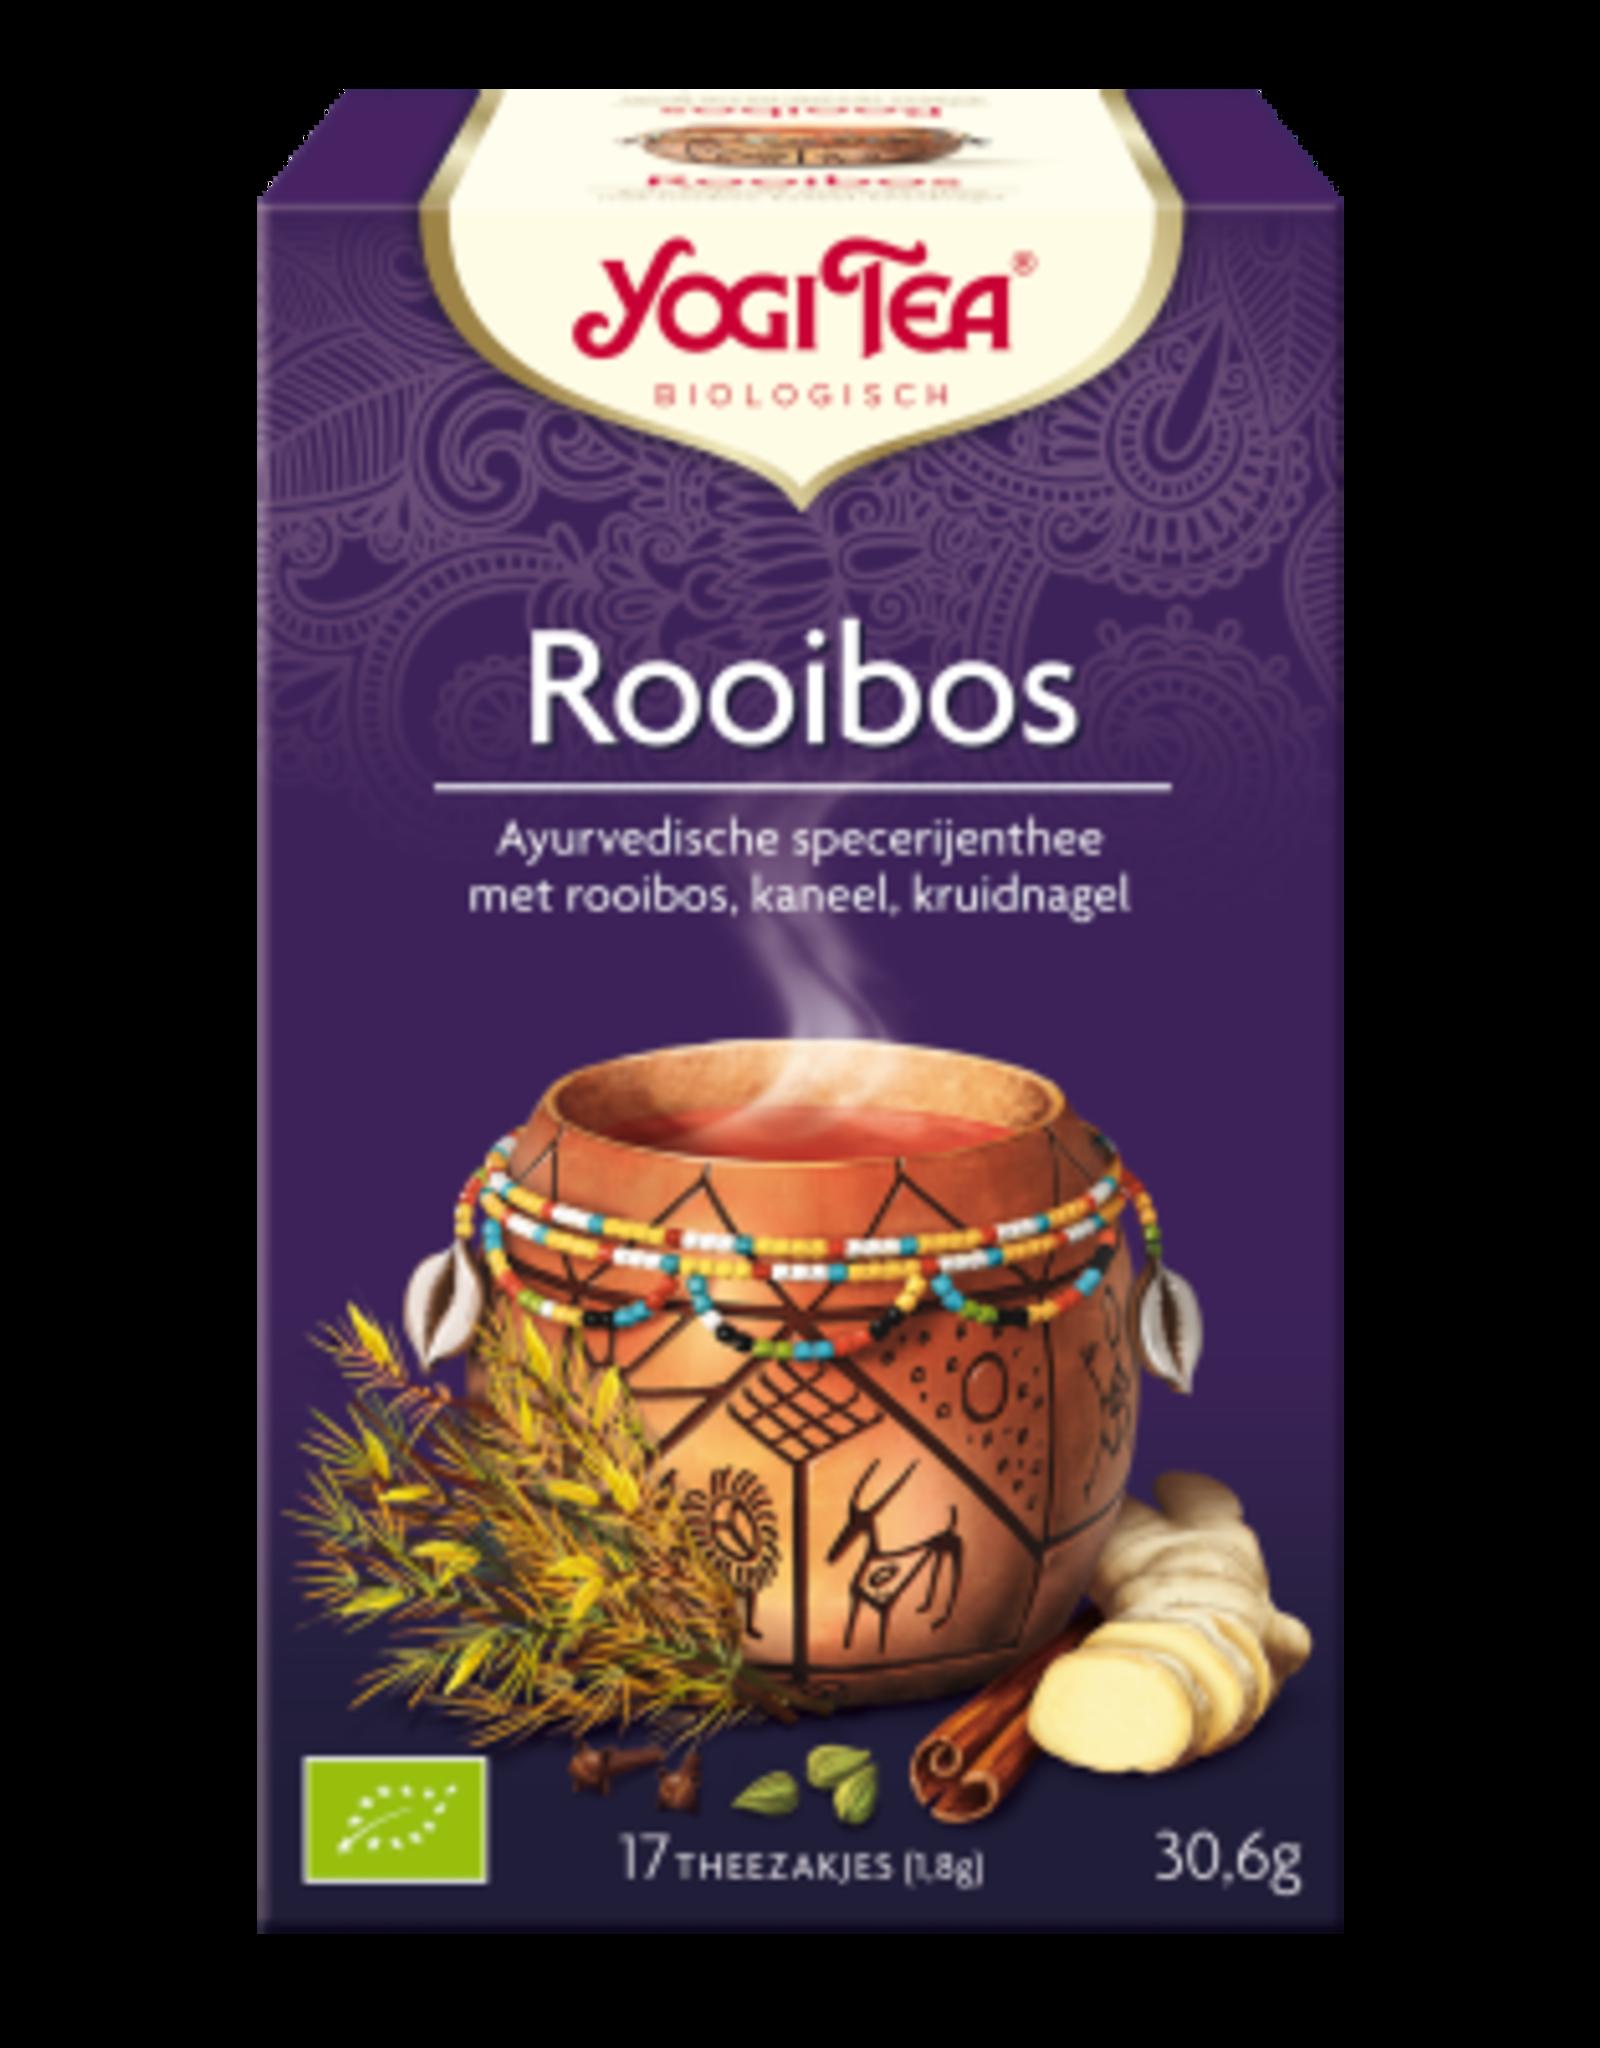 Yogi Tea Yogi Tea Rooibos